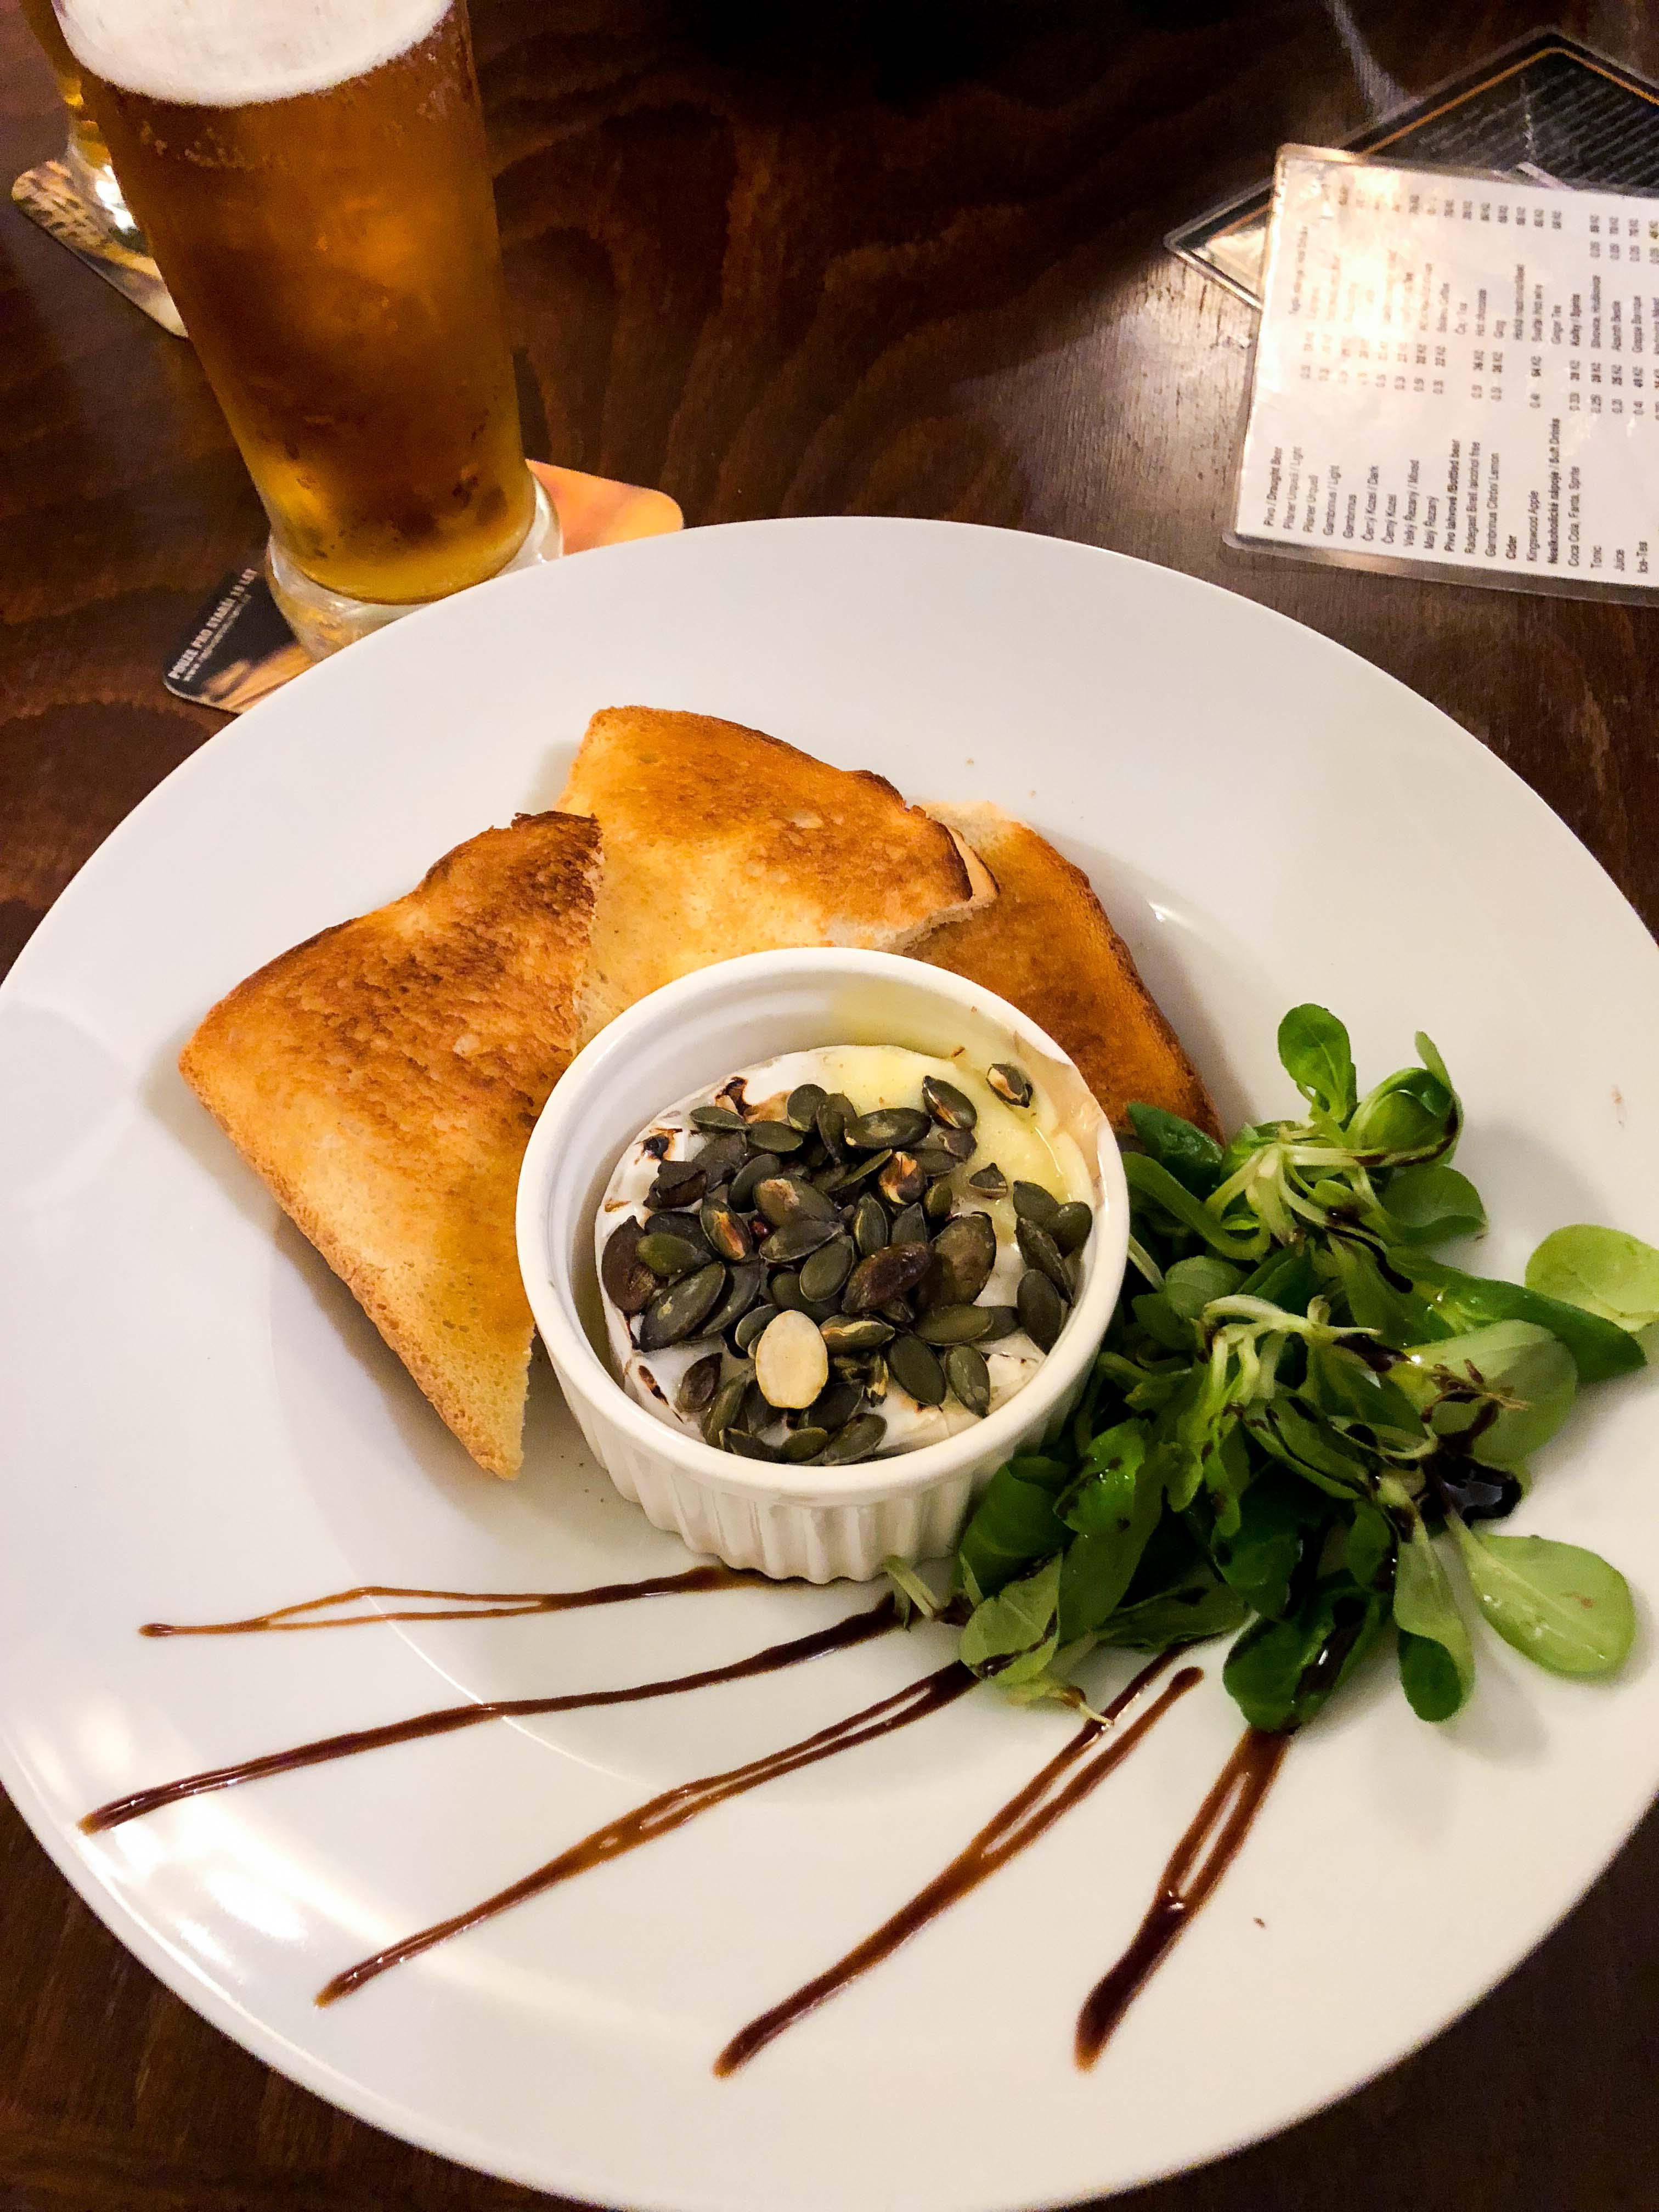 U Magistra Kelly Restaurant Insider Tipps Prag Food Tipps besten Restaurants Klöße Restaurant traditionell Vorspeise Camembert Reiseblog